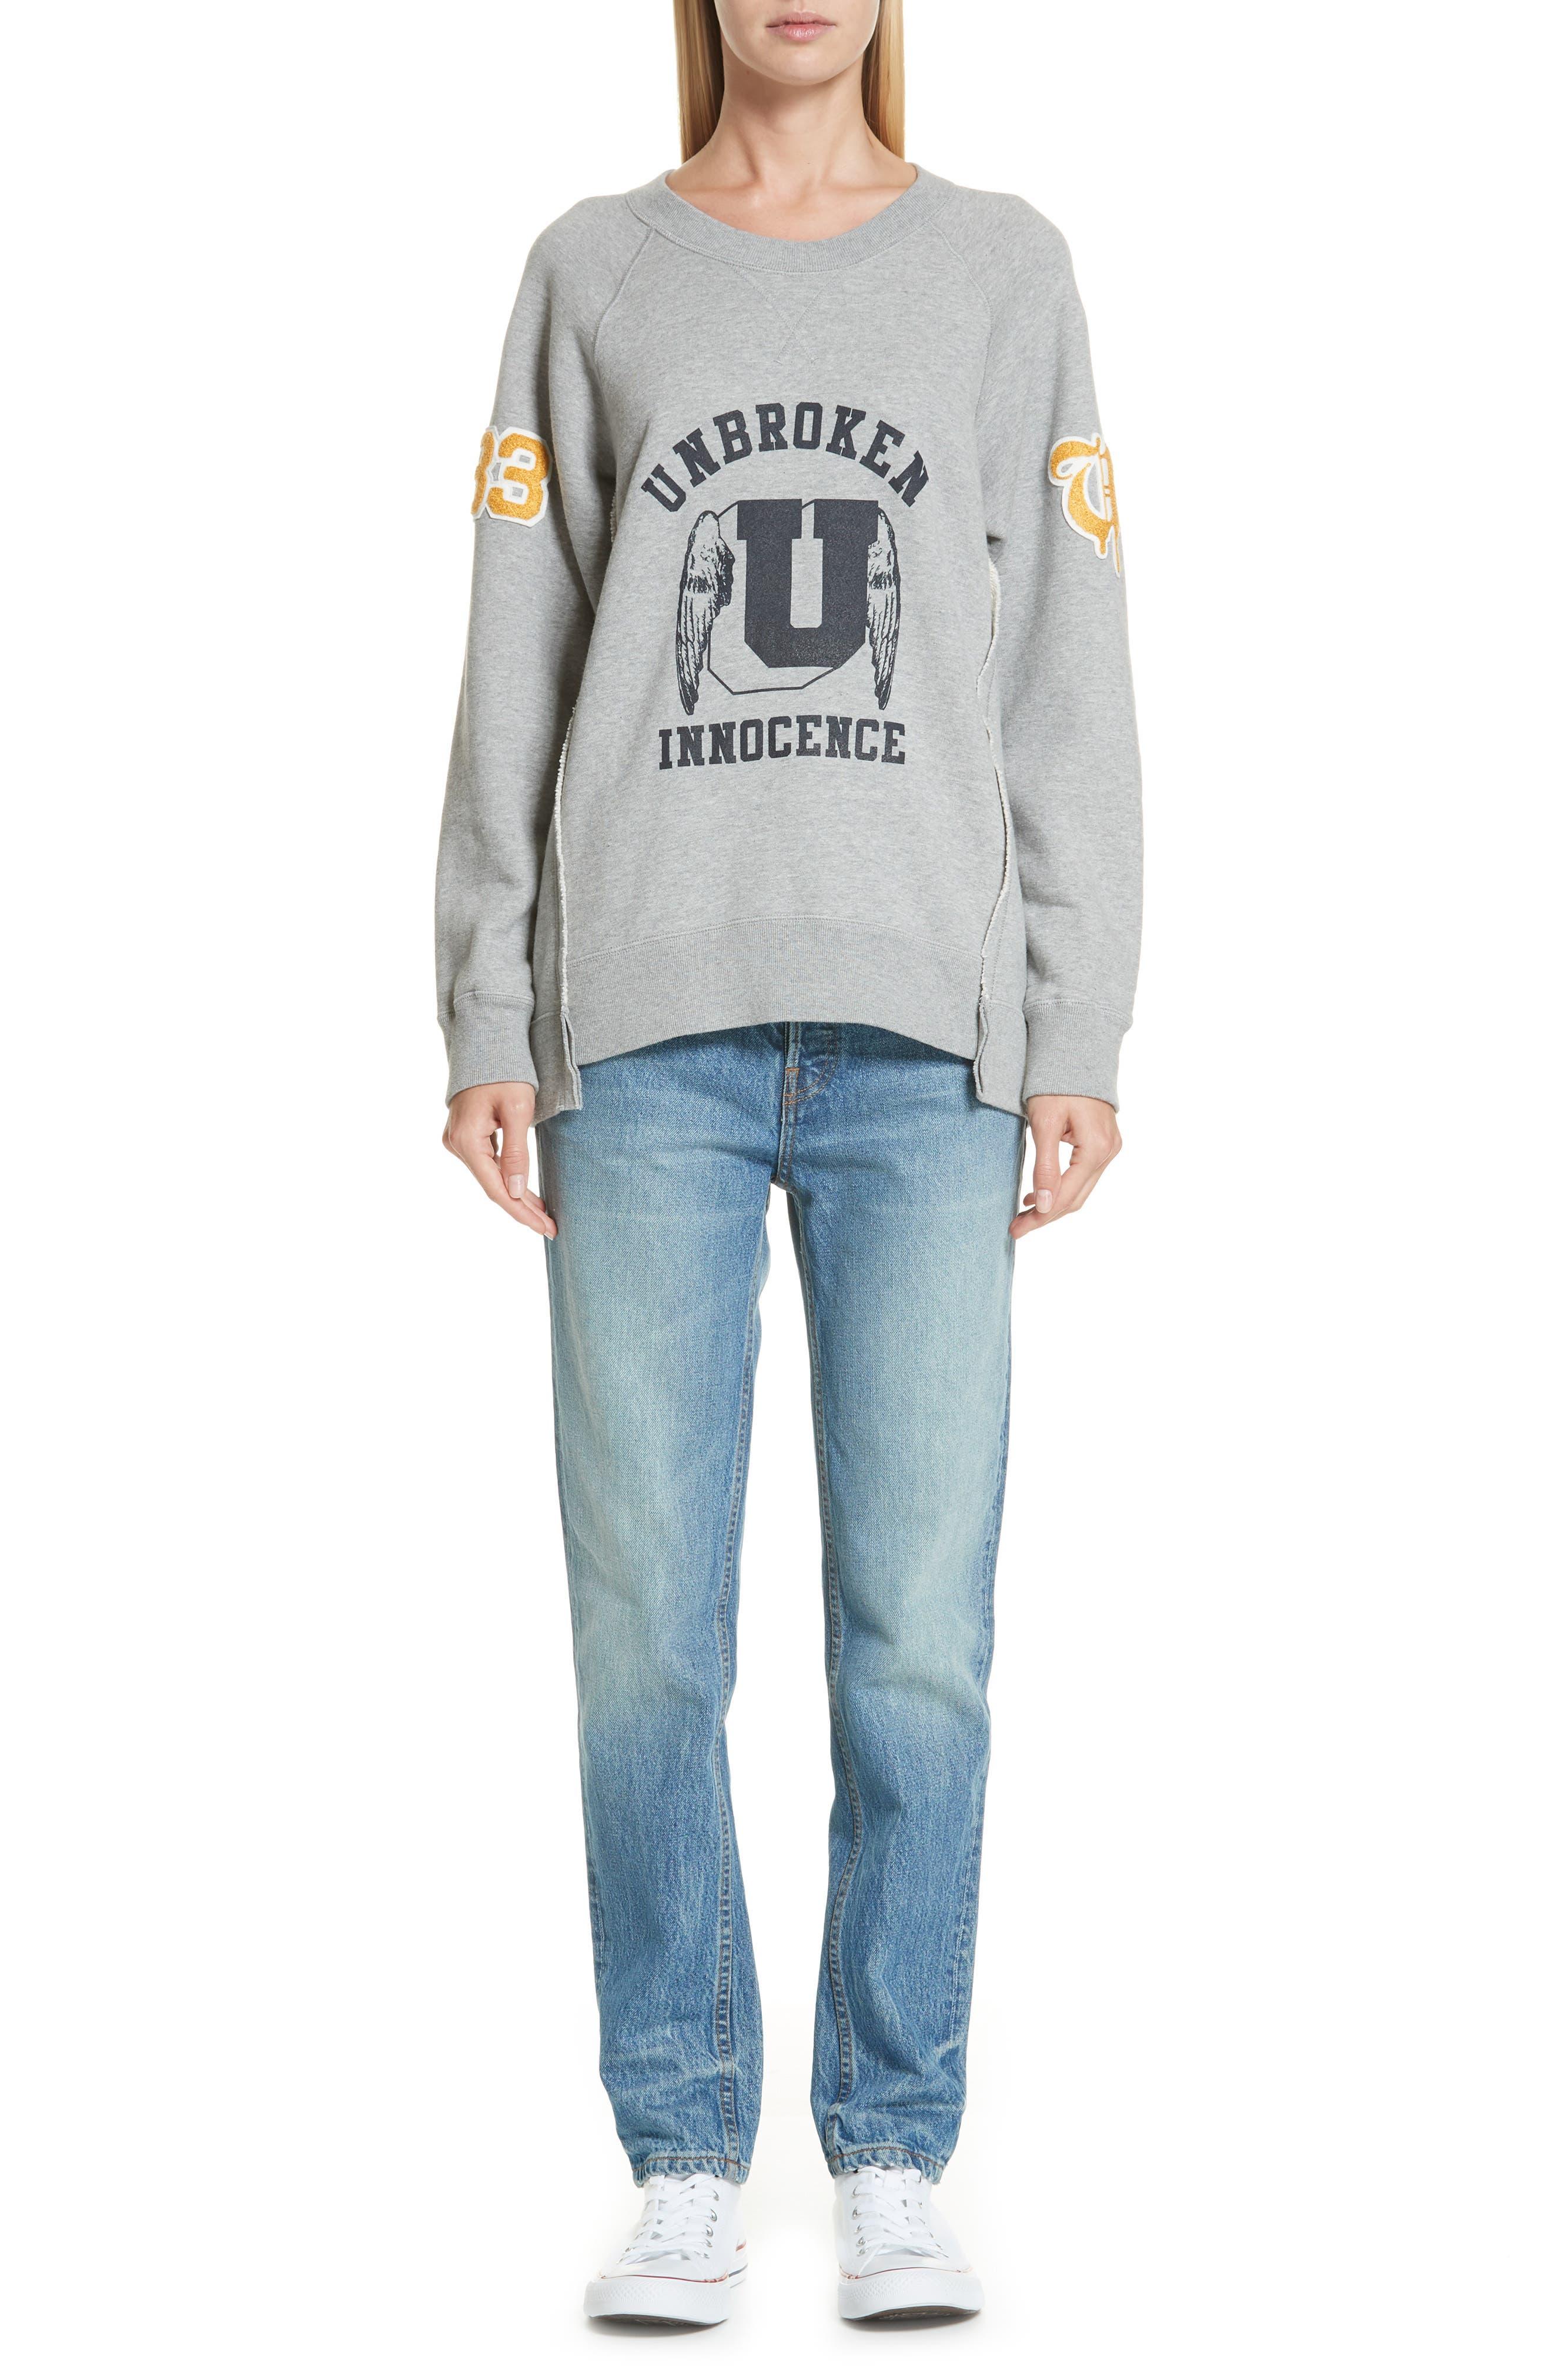 Unbroken Innocence Sweatshirt,                             Alternate thumbnail 7, color,                             B TOP GRAY